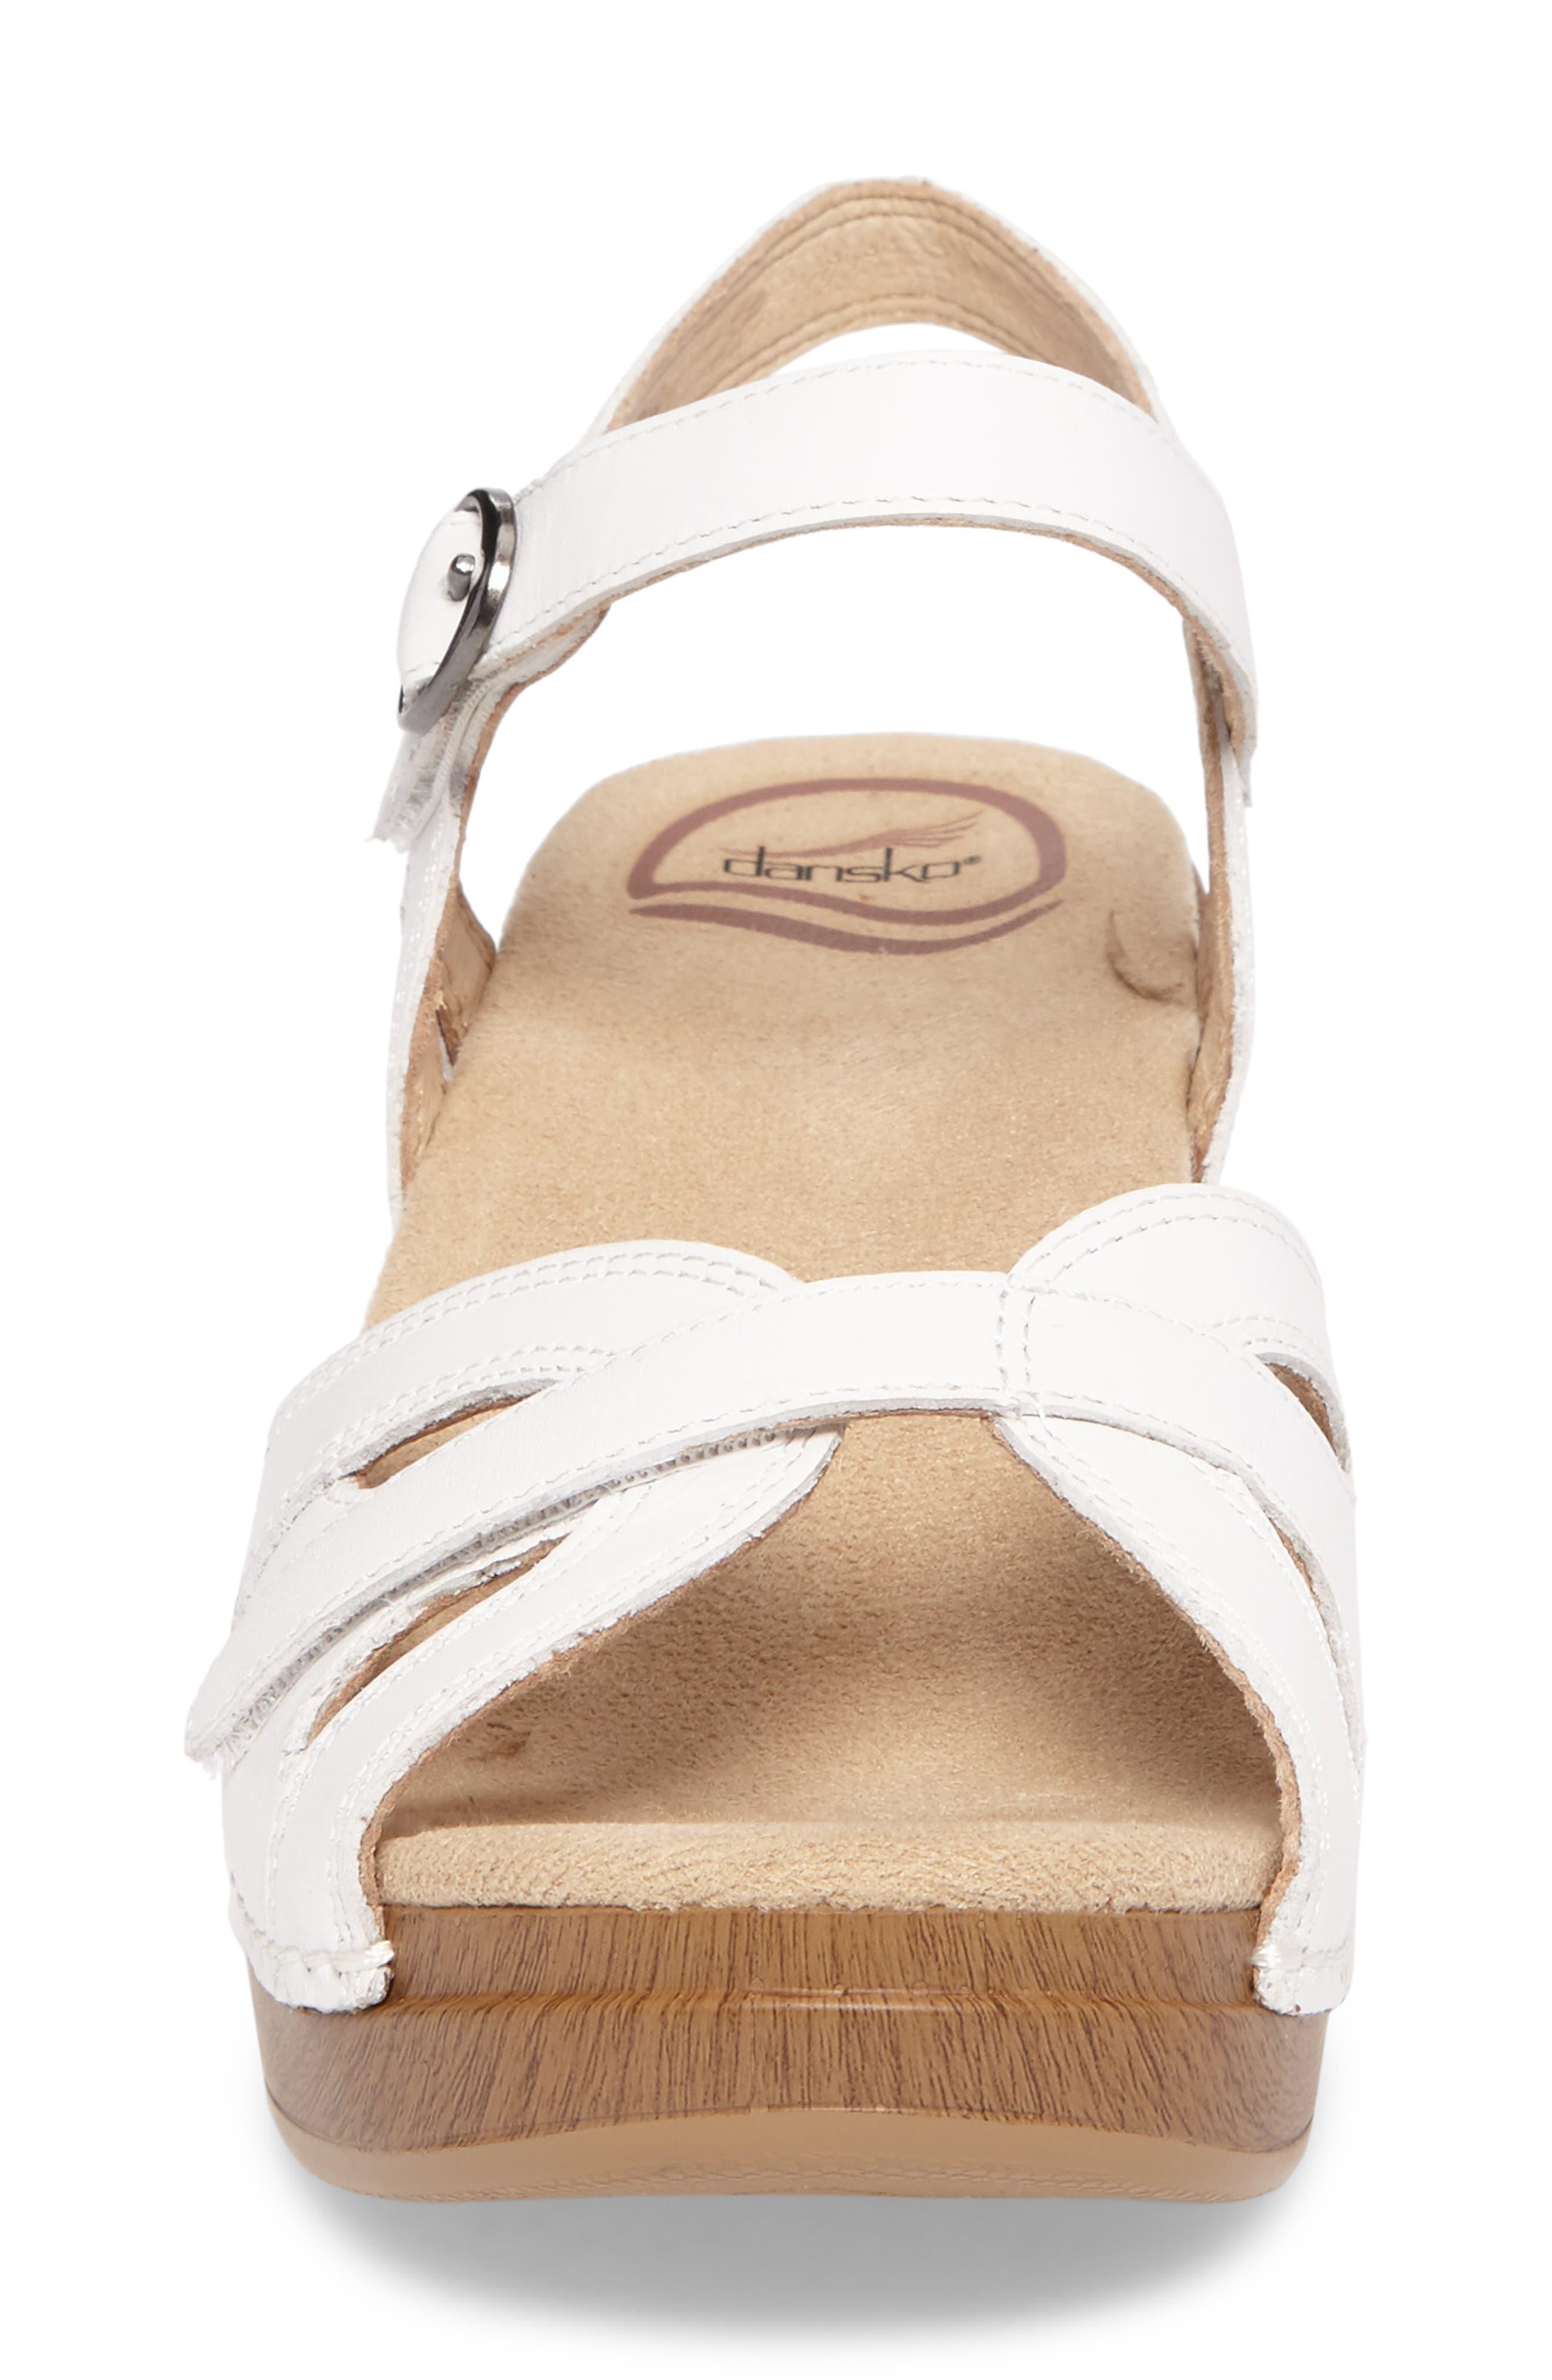 Season Sandal,                             Alternate thumbnail 4, color,                             White Leather